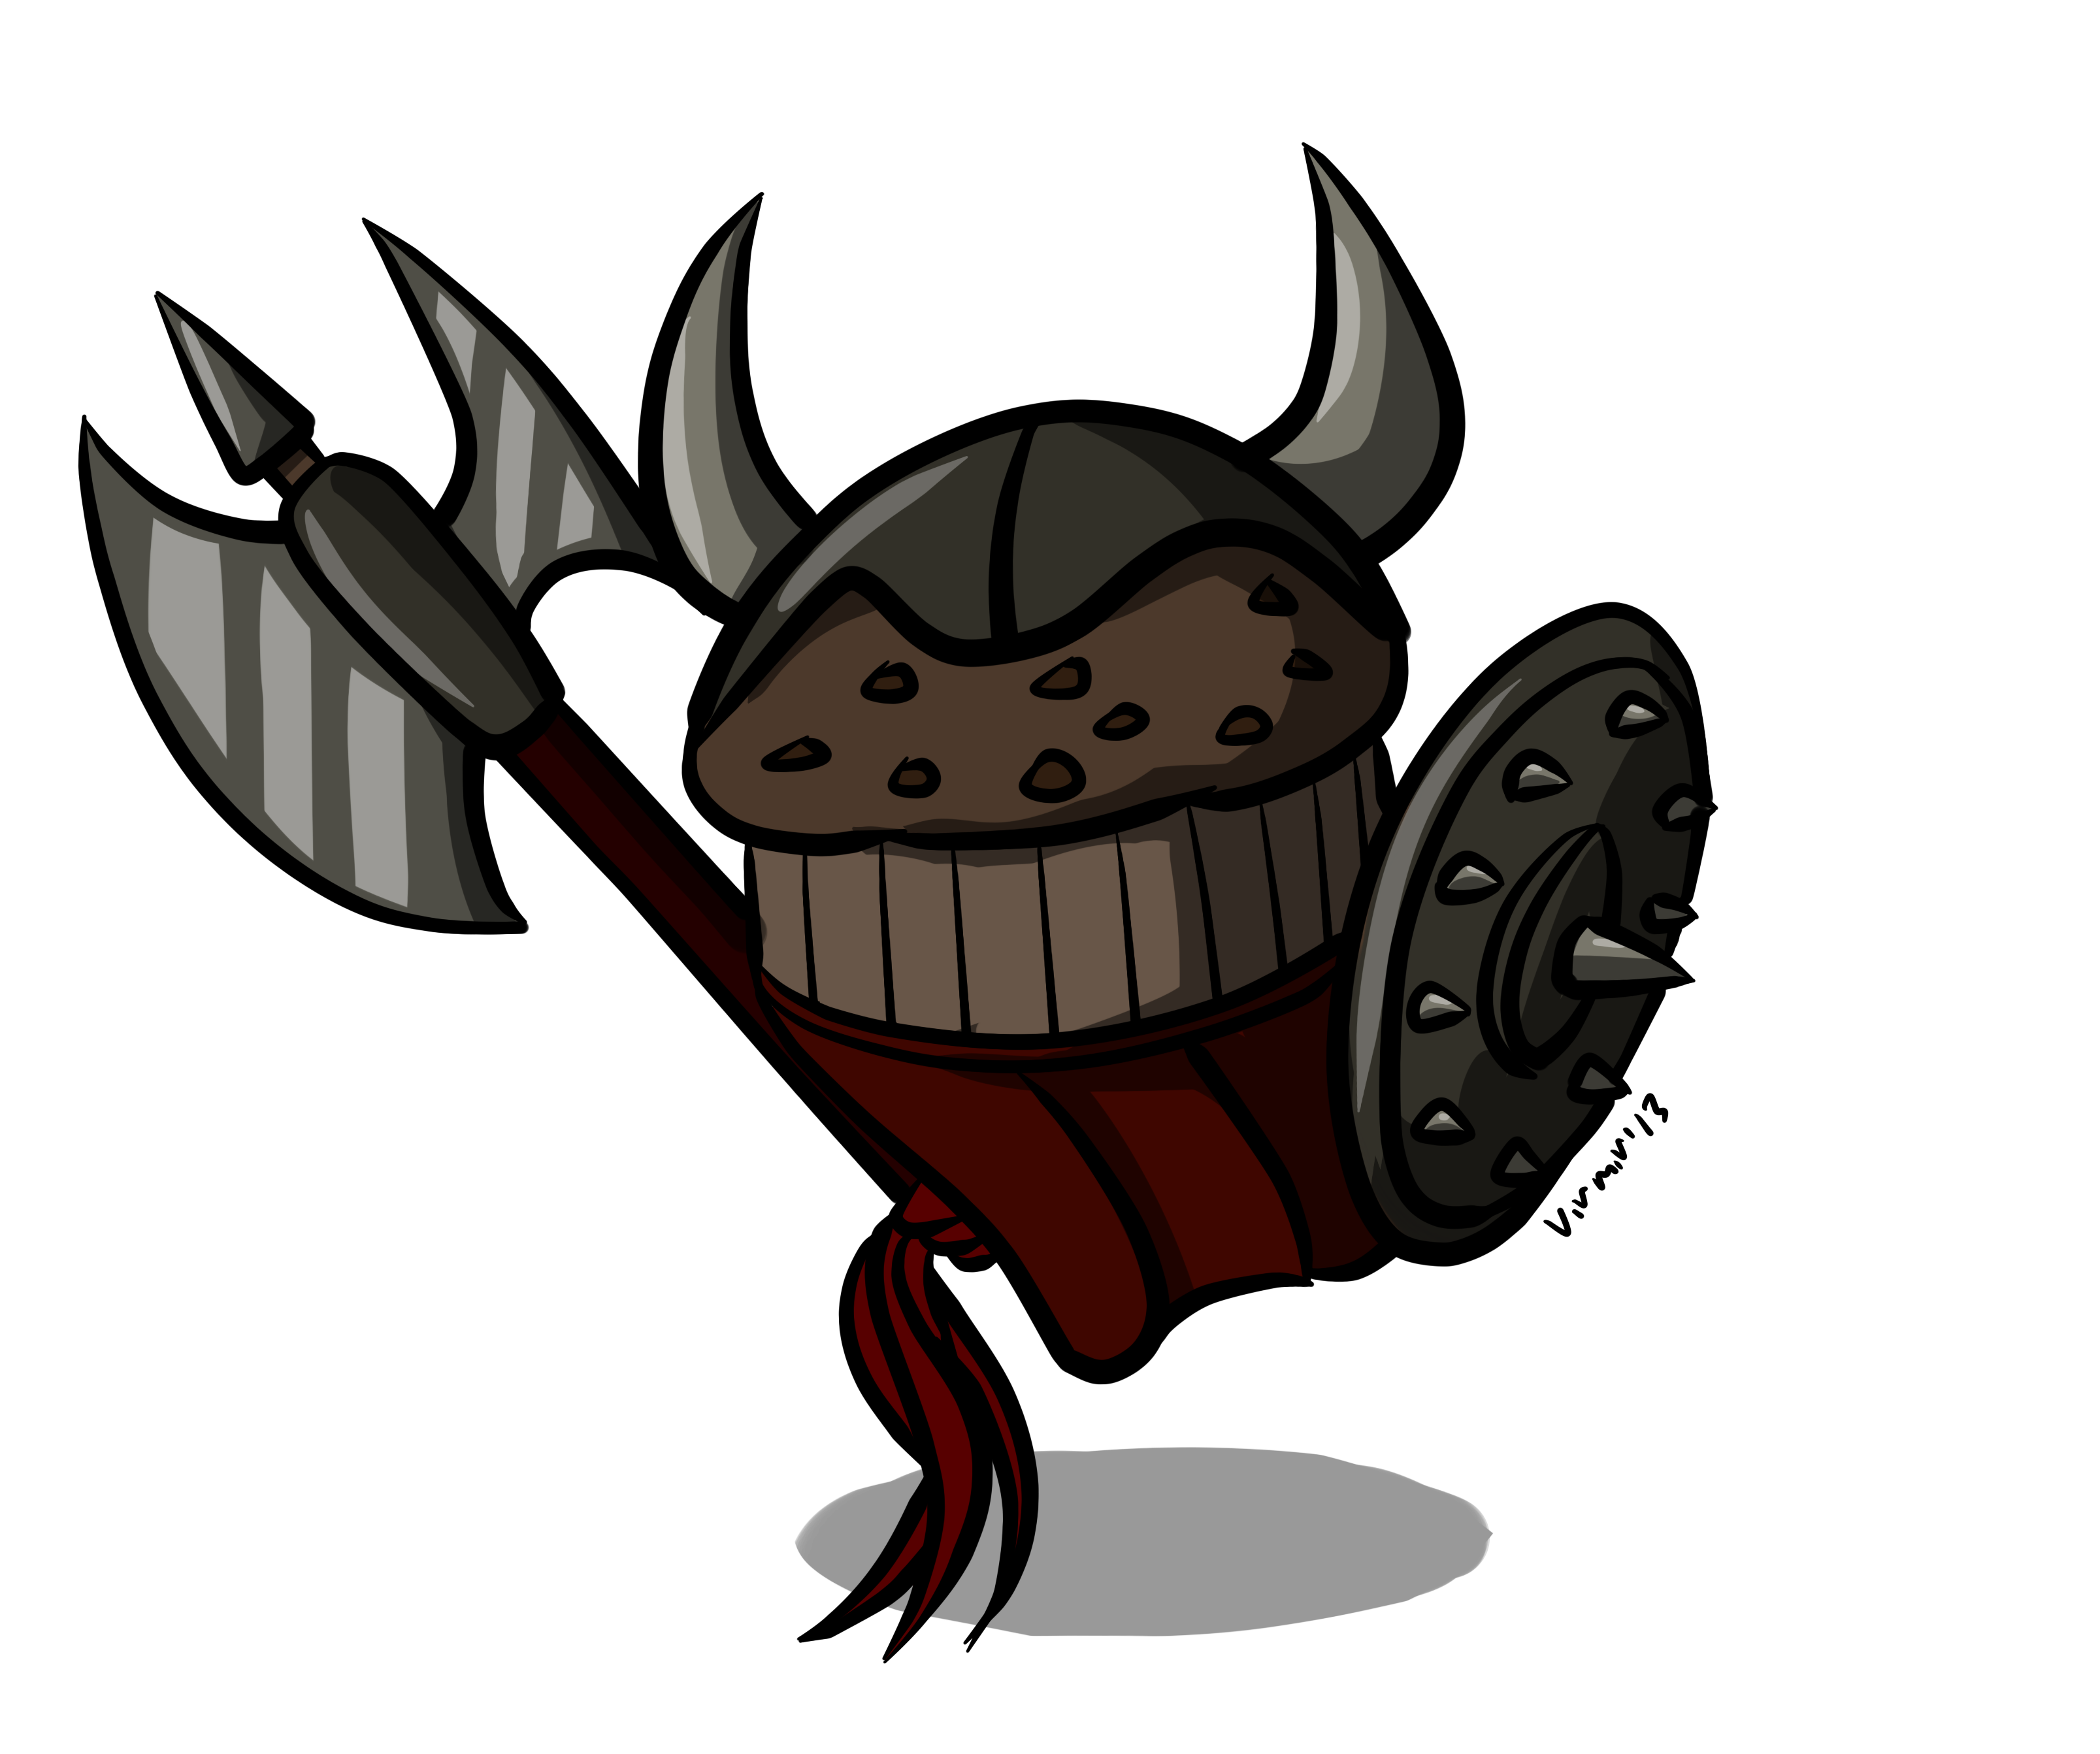 Muffin clipart muffin man. Art by virmir evil